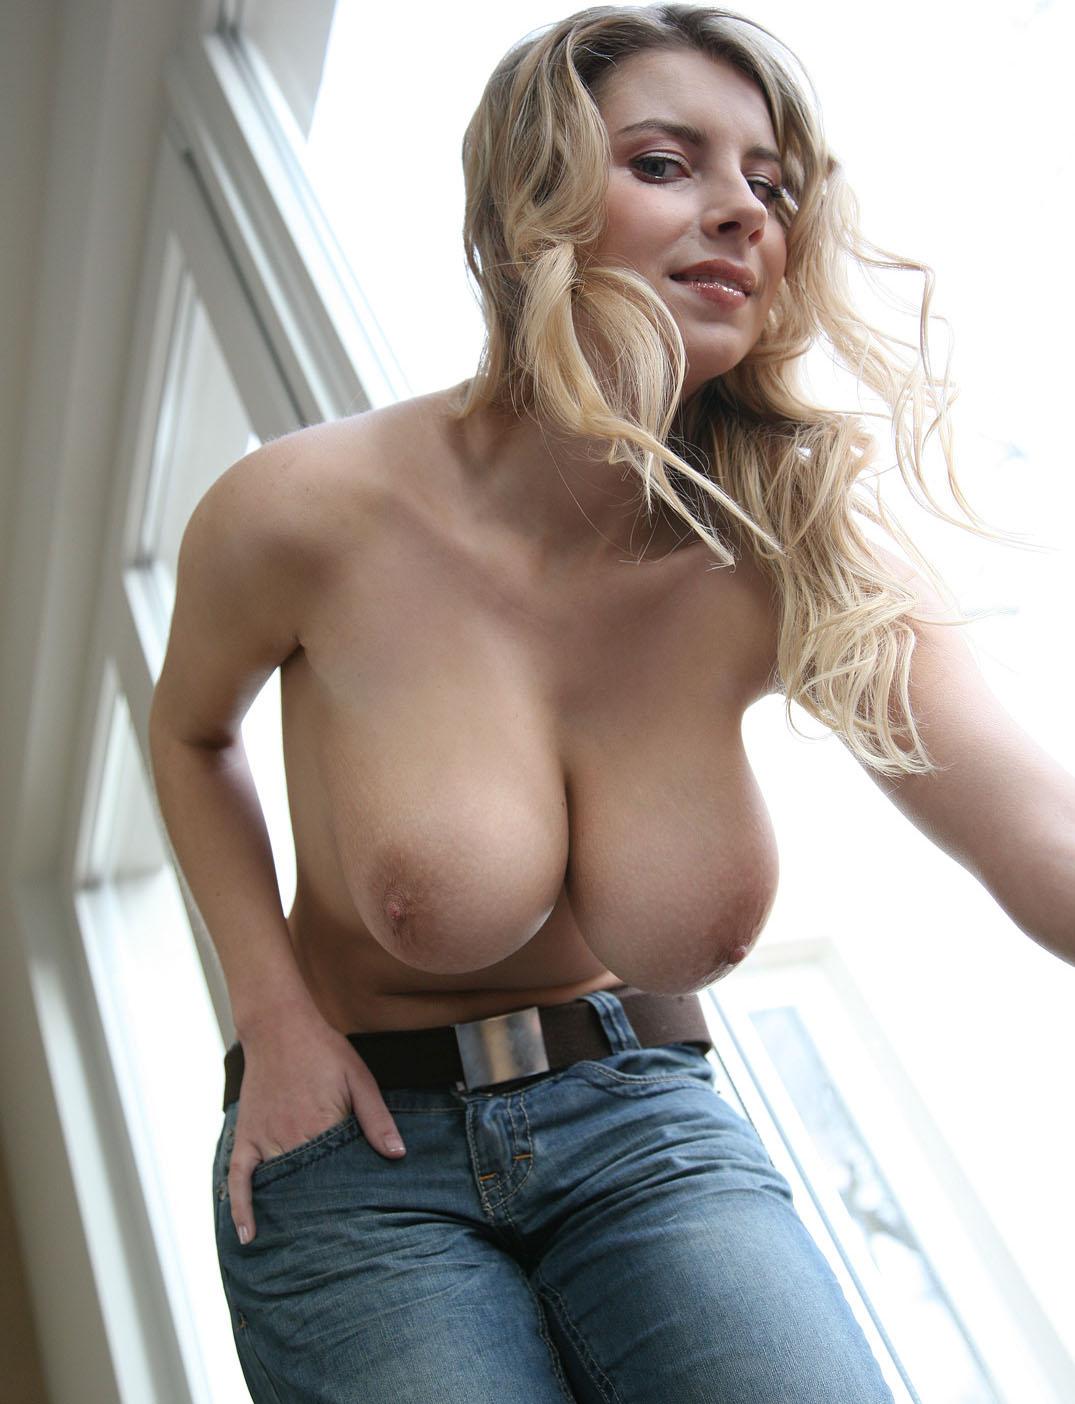 katarina-hartlova-jeans-big-tits-naked-window-04